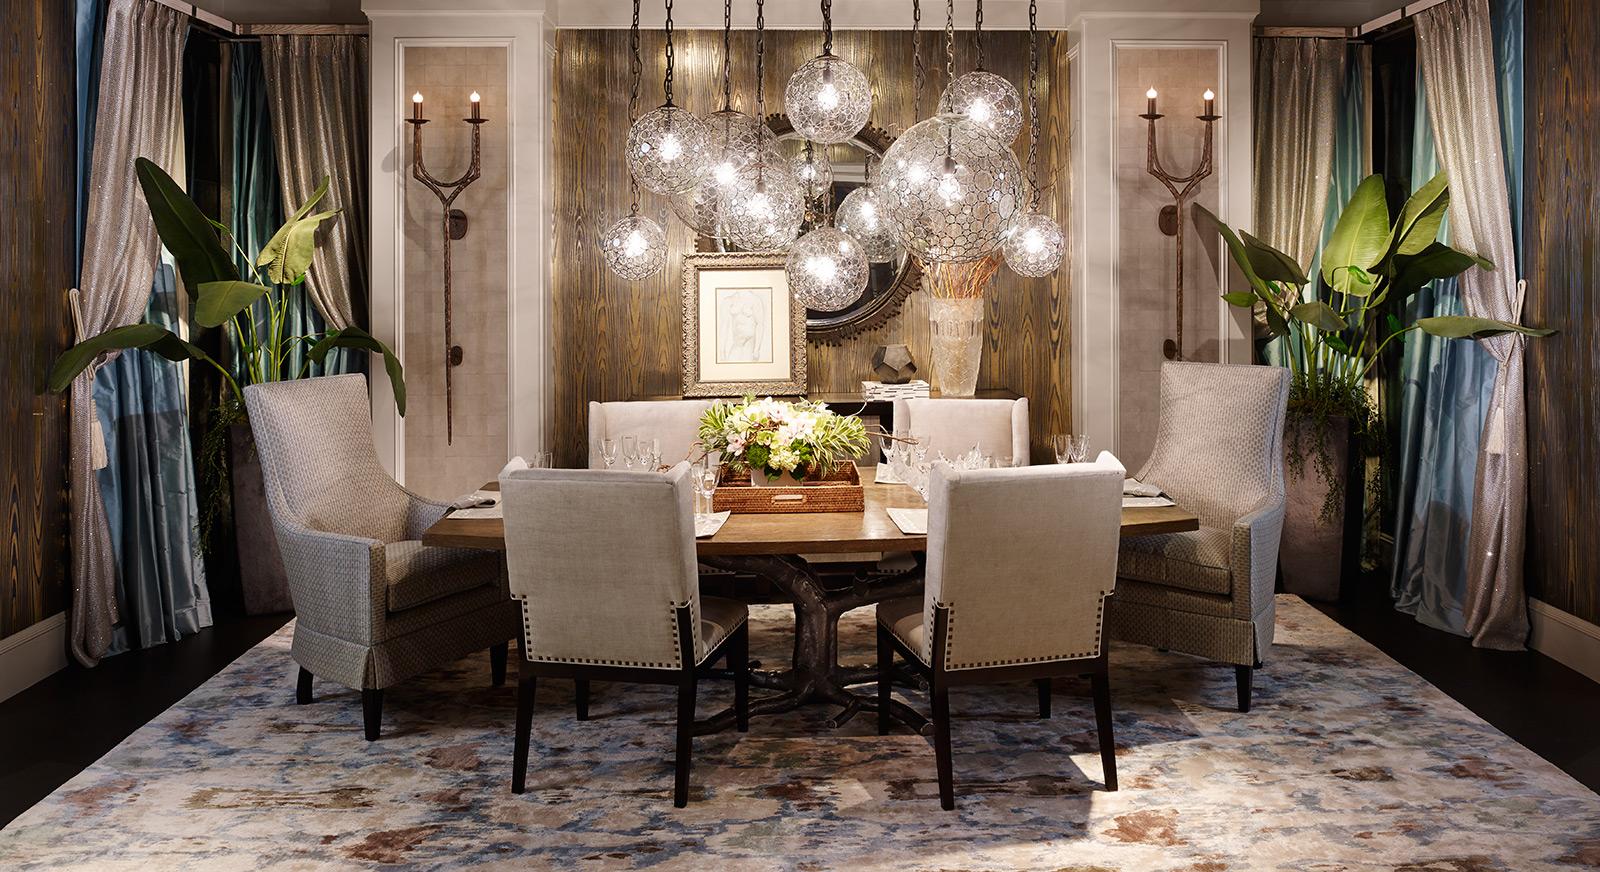 dreamhome.diningroom.jpg